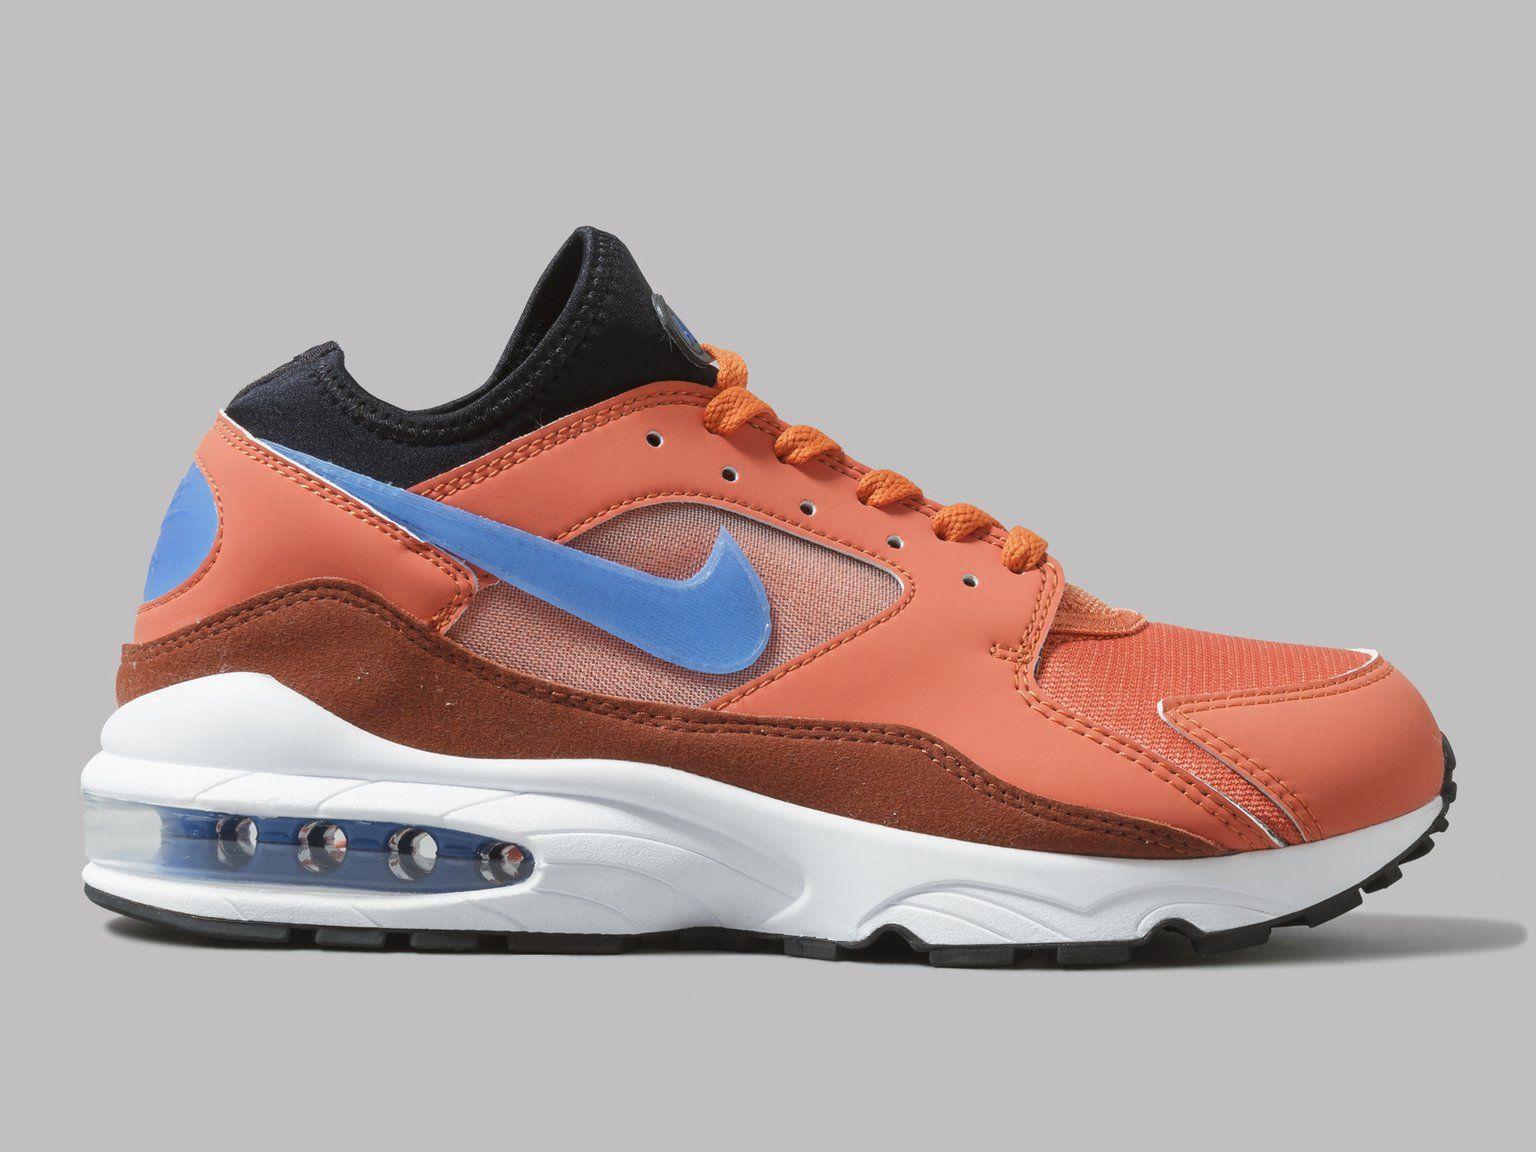 moral La base de datos Despertar  air max 93 vintage coral Cheap Nike Air Max Shoes